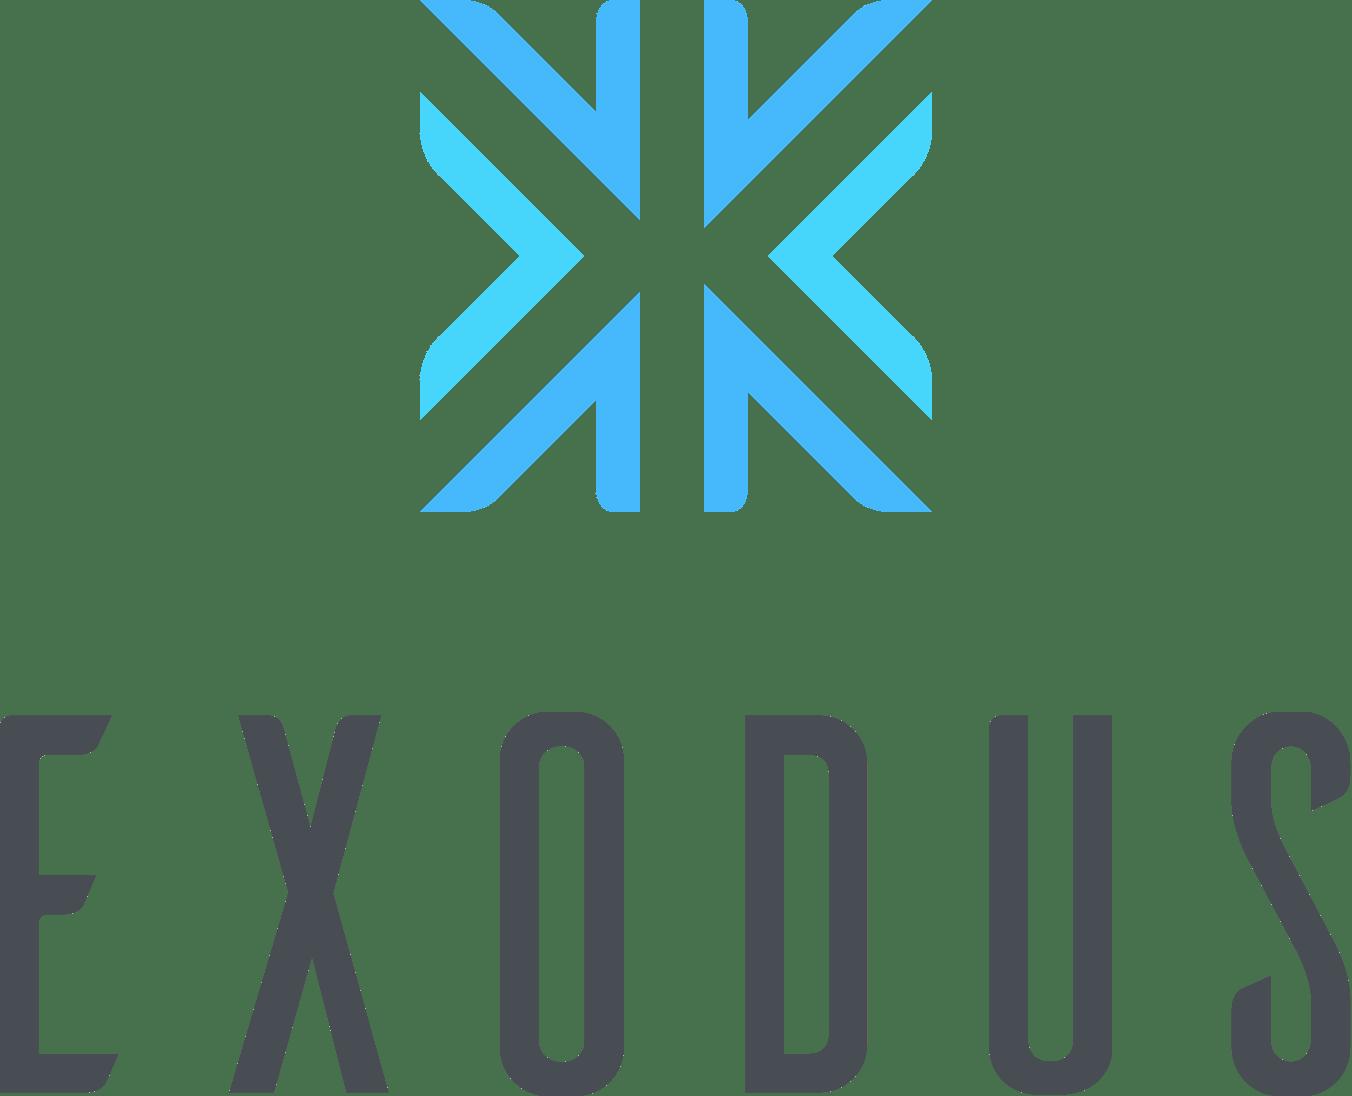 Exodus paper wallet